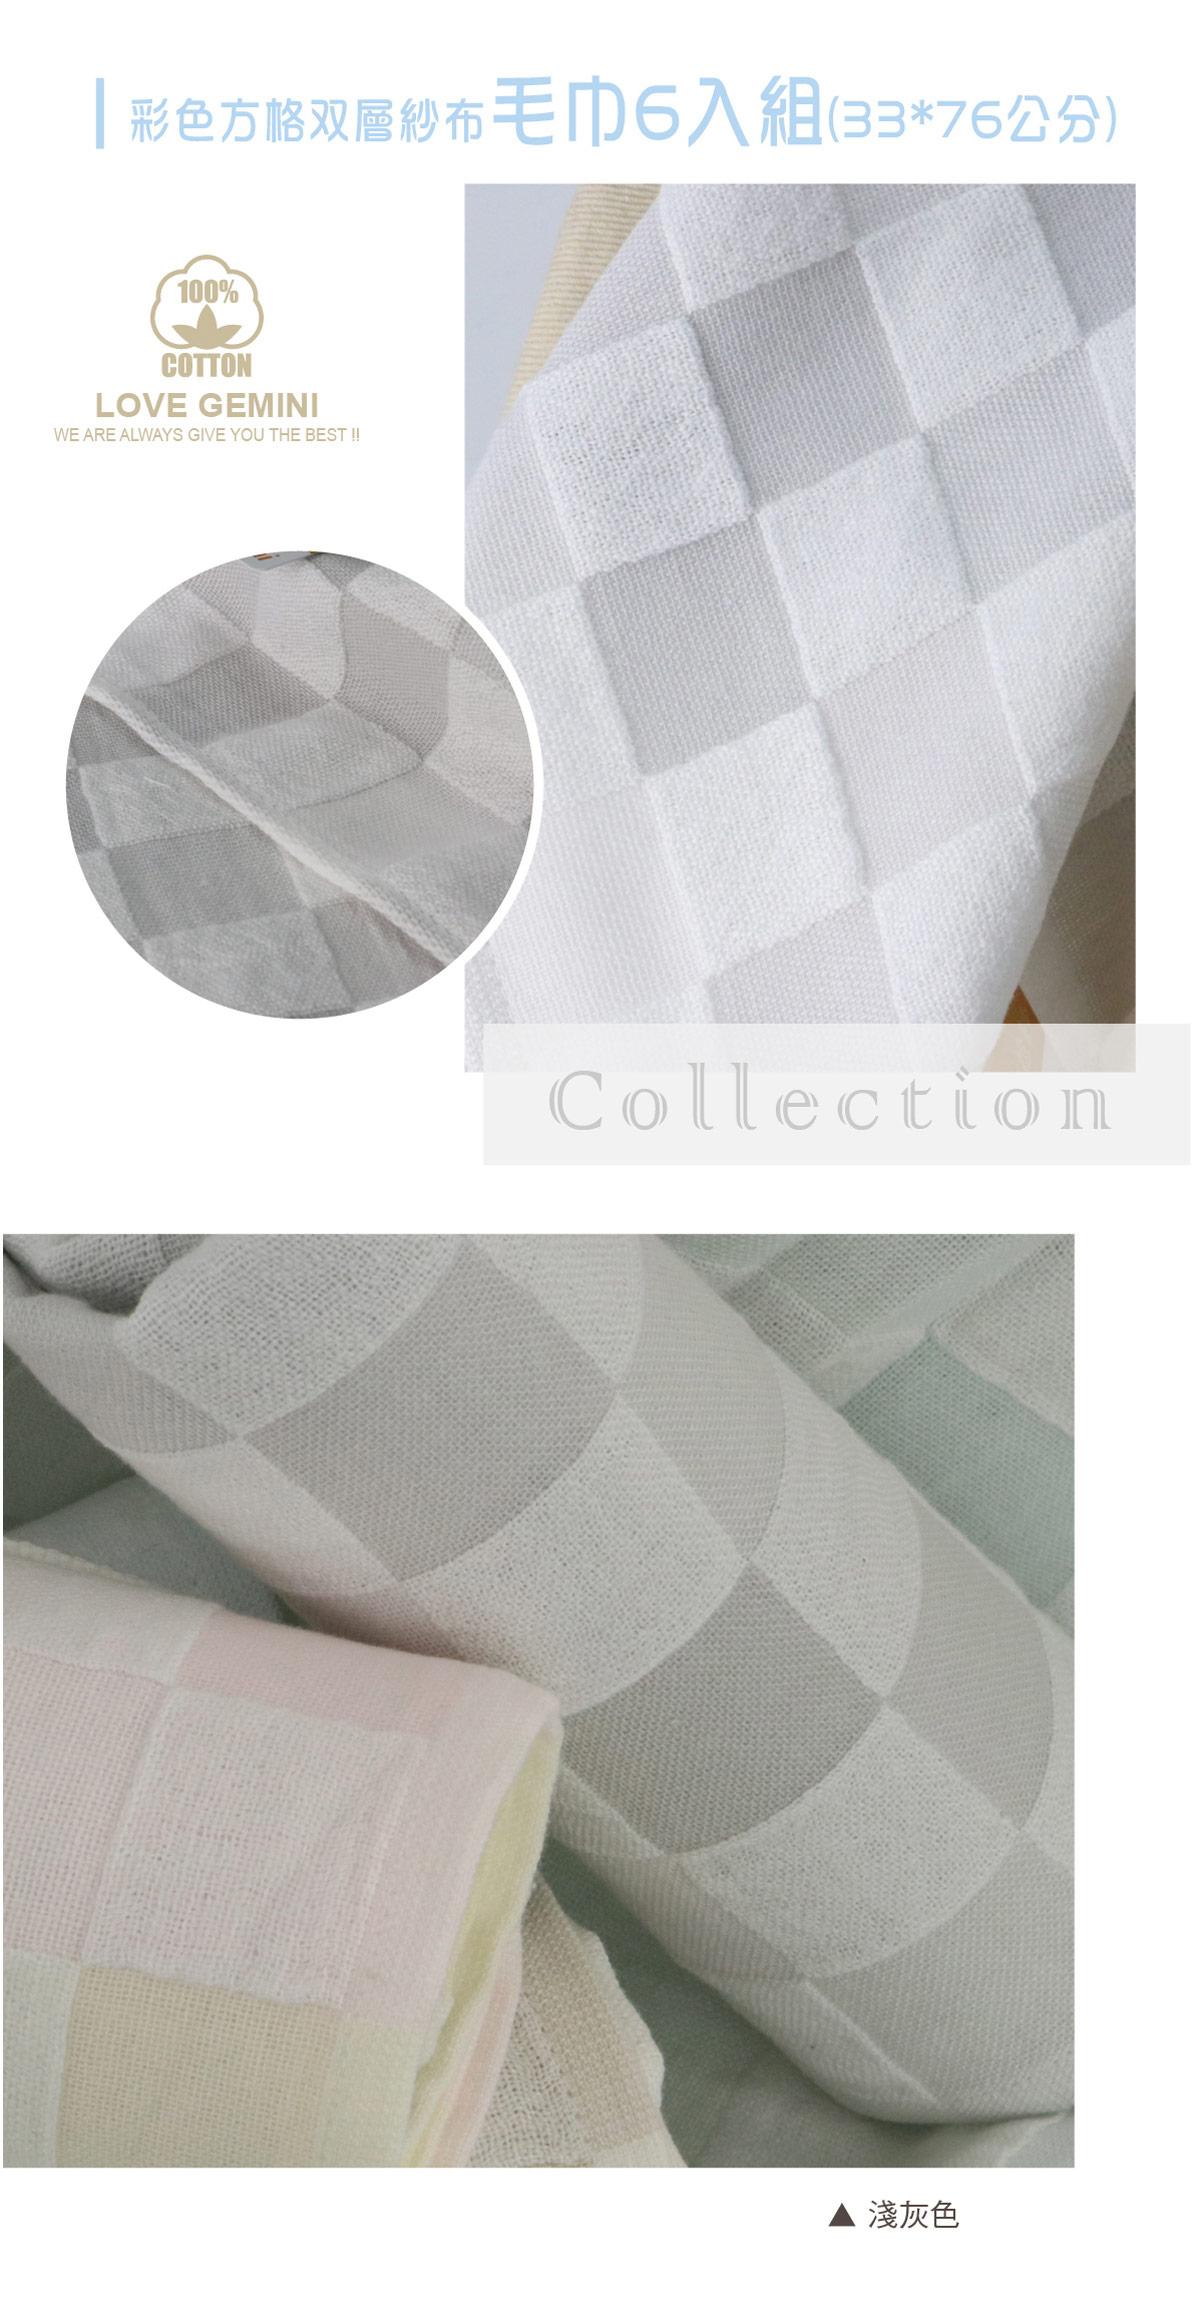 Gemini雙星毛巾彩色方格雙層紗布毛巾淺灰色。